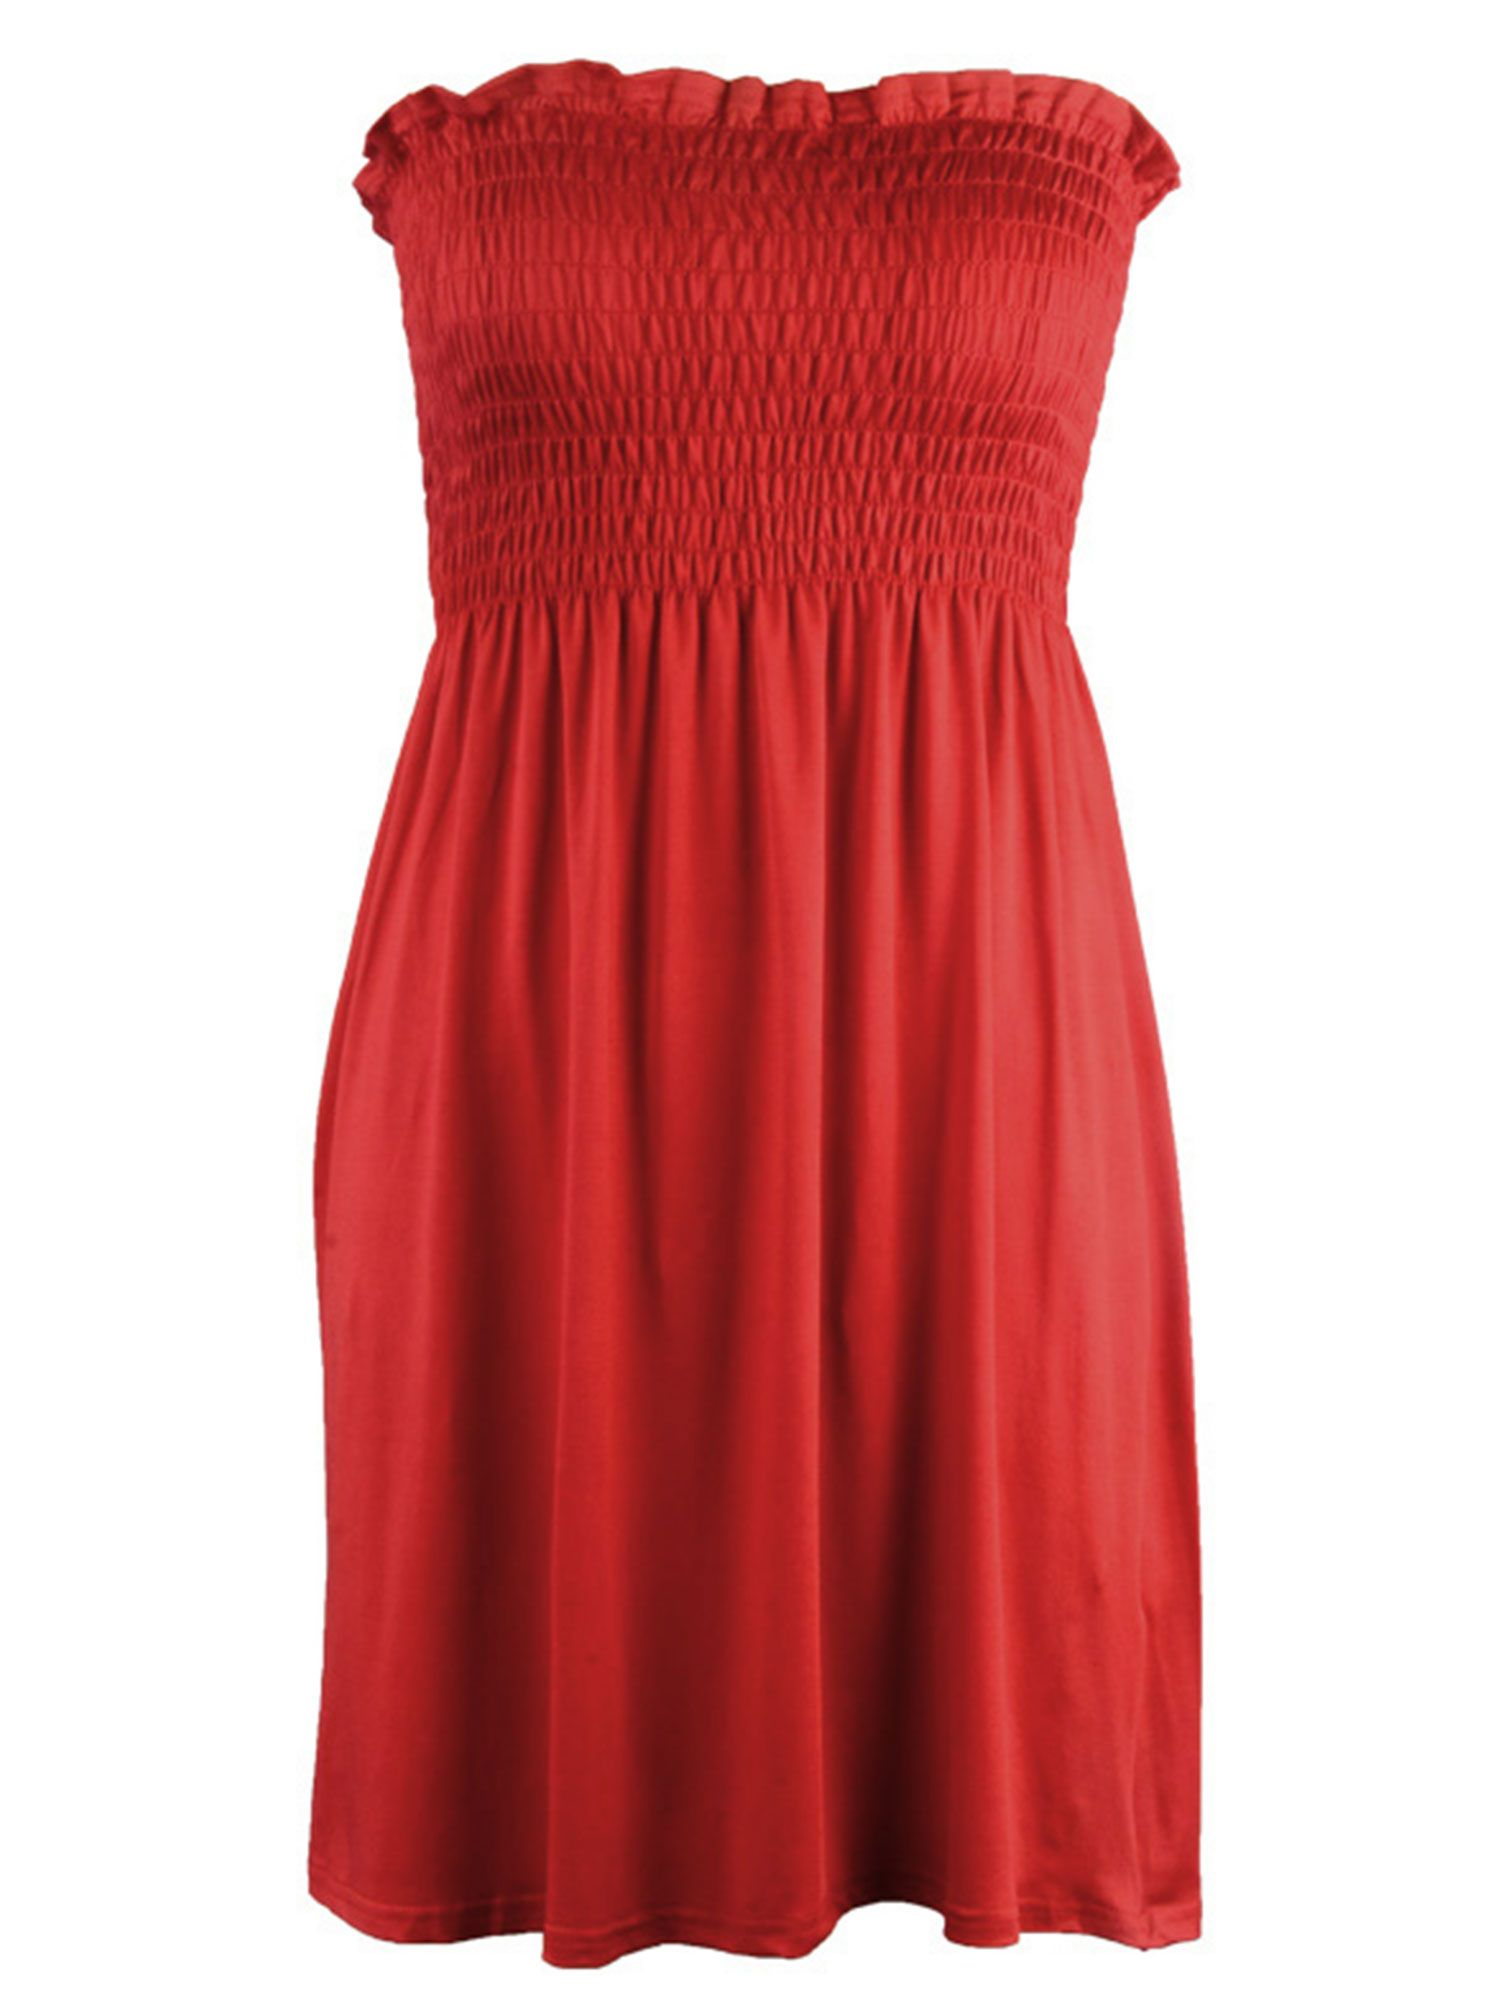 New Women printed Strapless Sheering Bandeau Shirred Summer Mini Dress Top